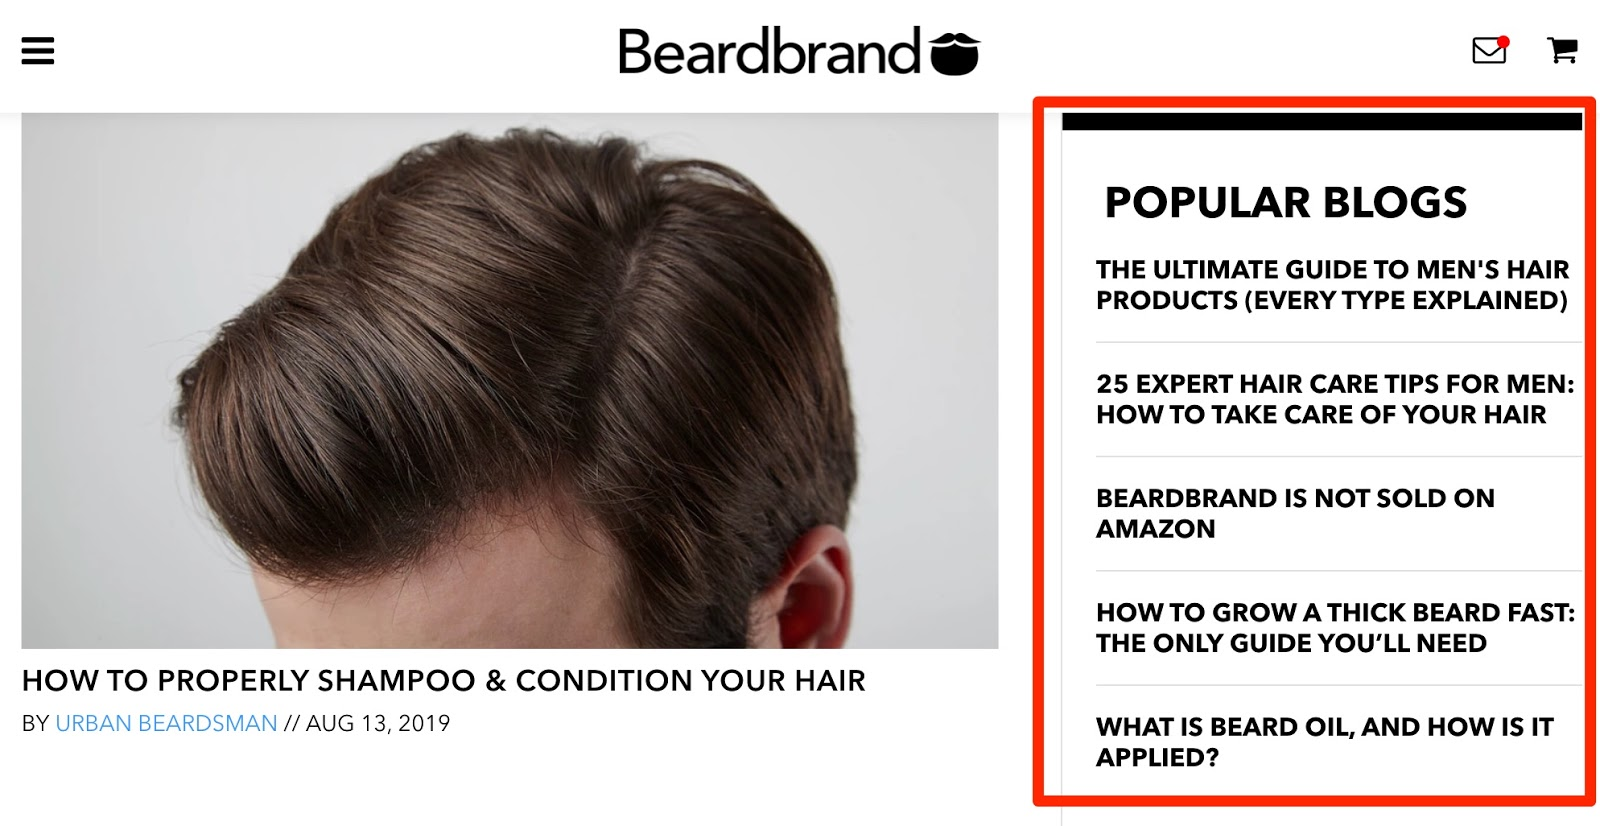 Urban Beardsman the Beardbrand Blog